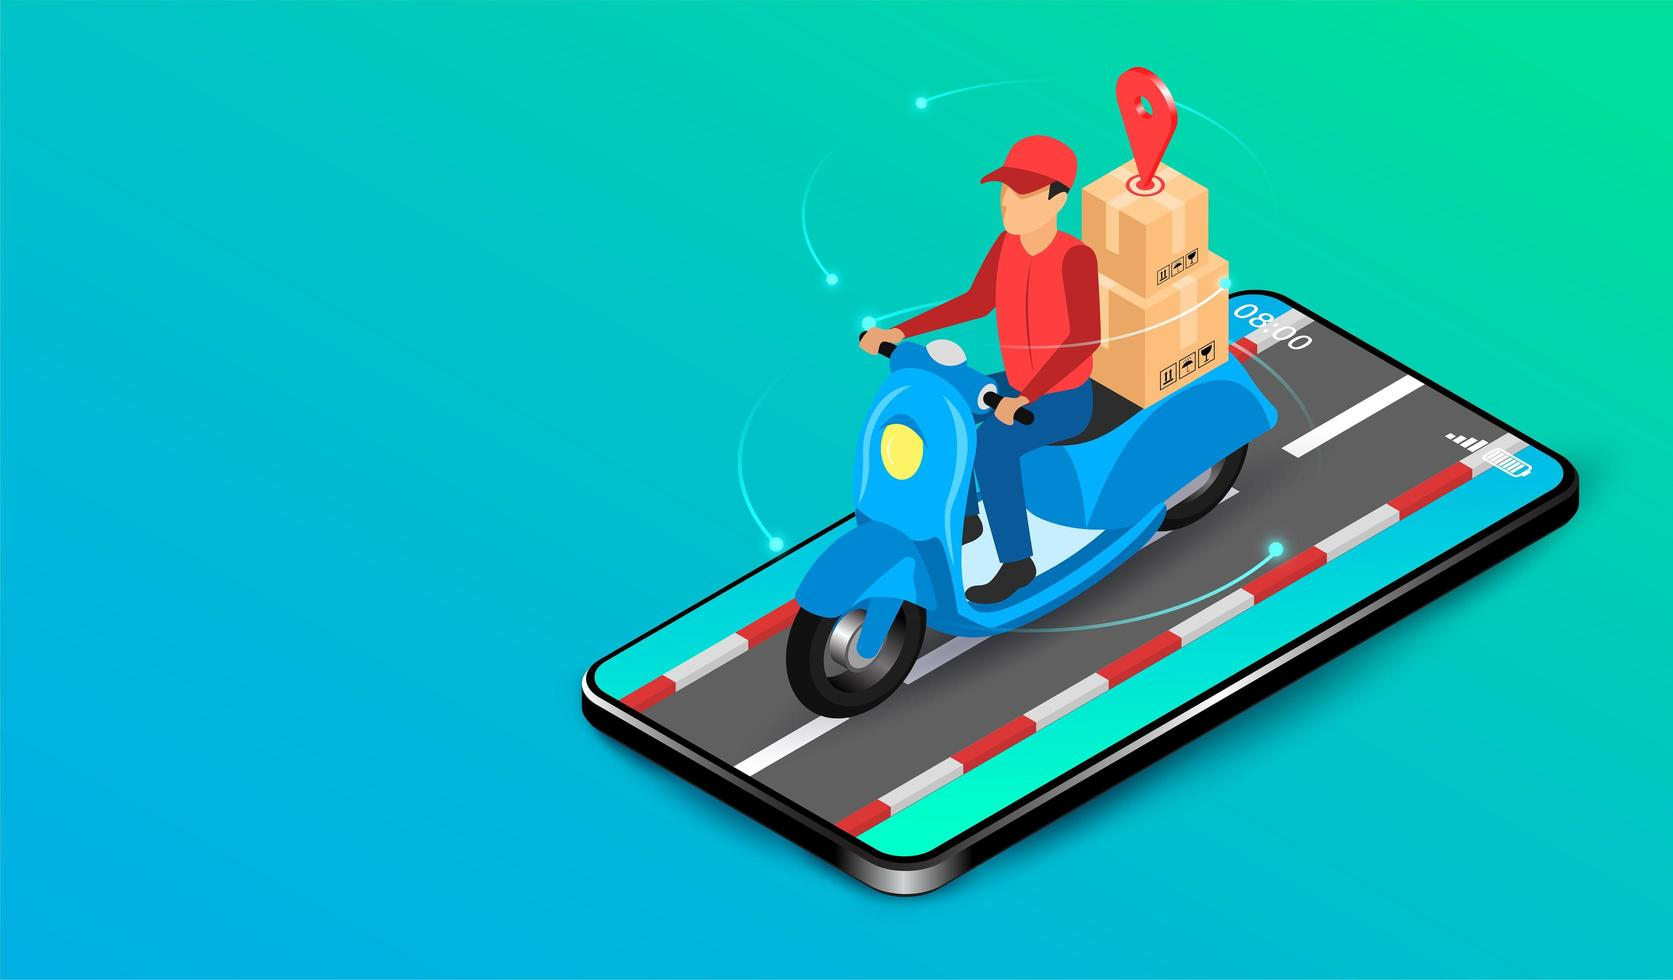 mobil app leverans man på skoter vektor